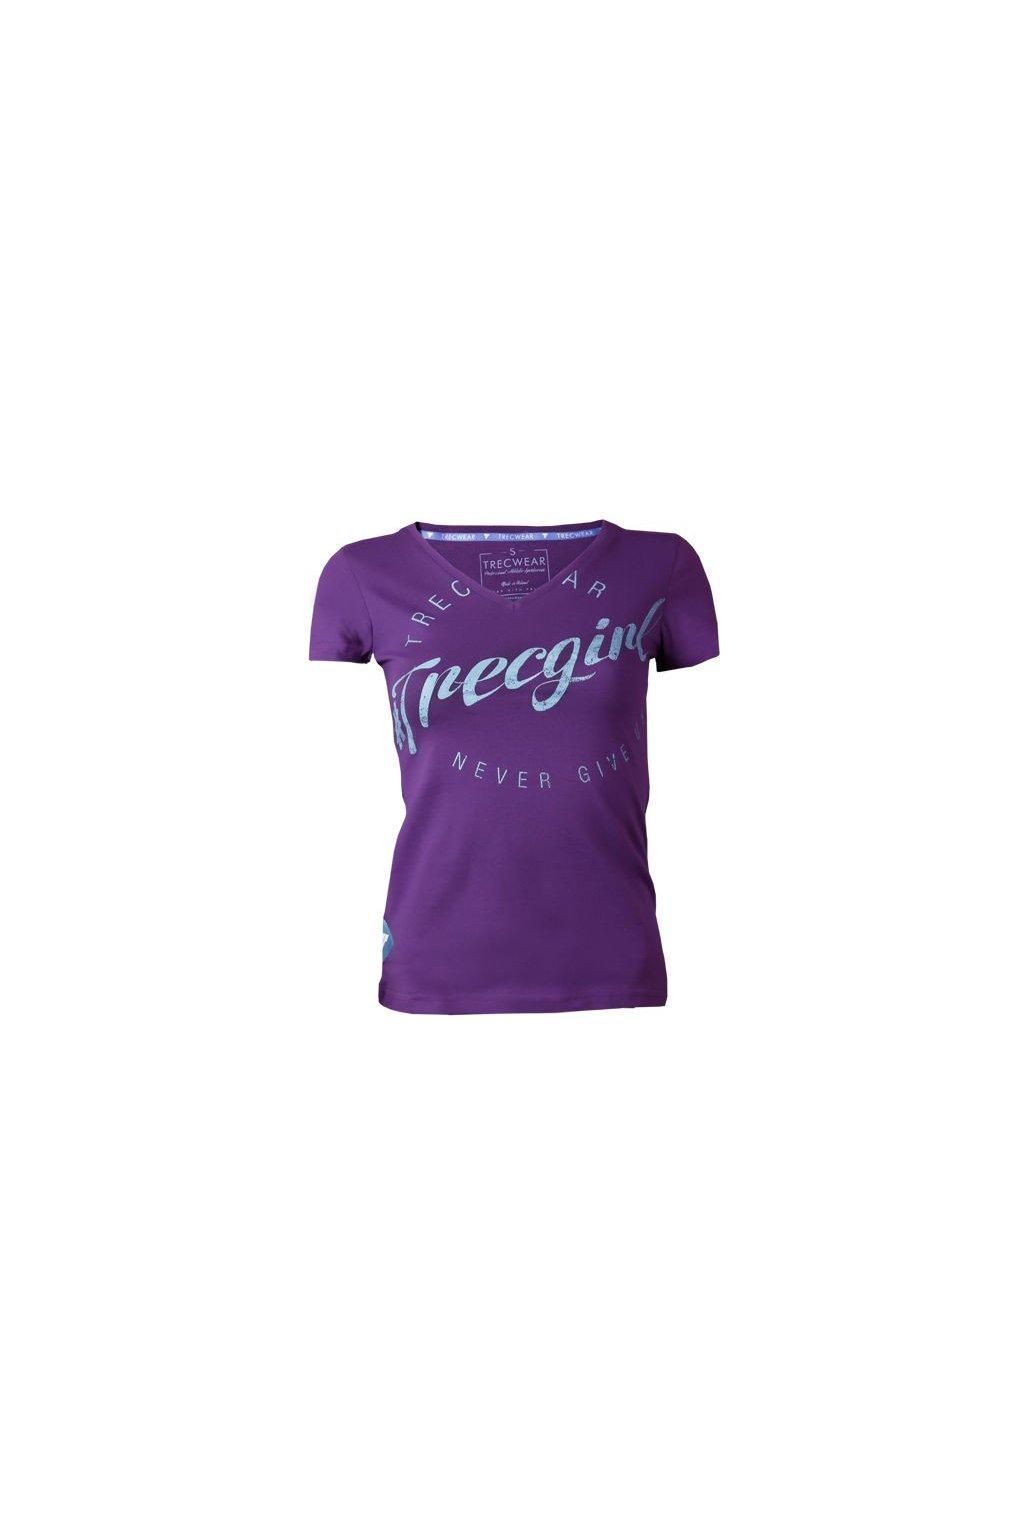 TrecWear Trecgirl tričko 001